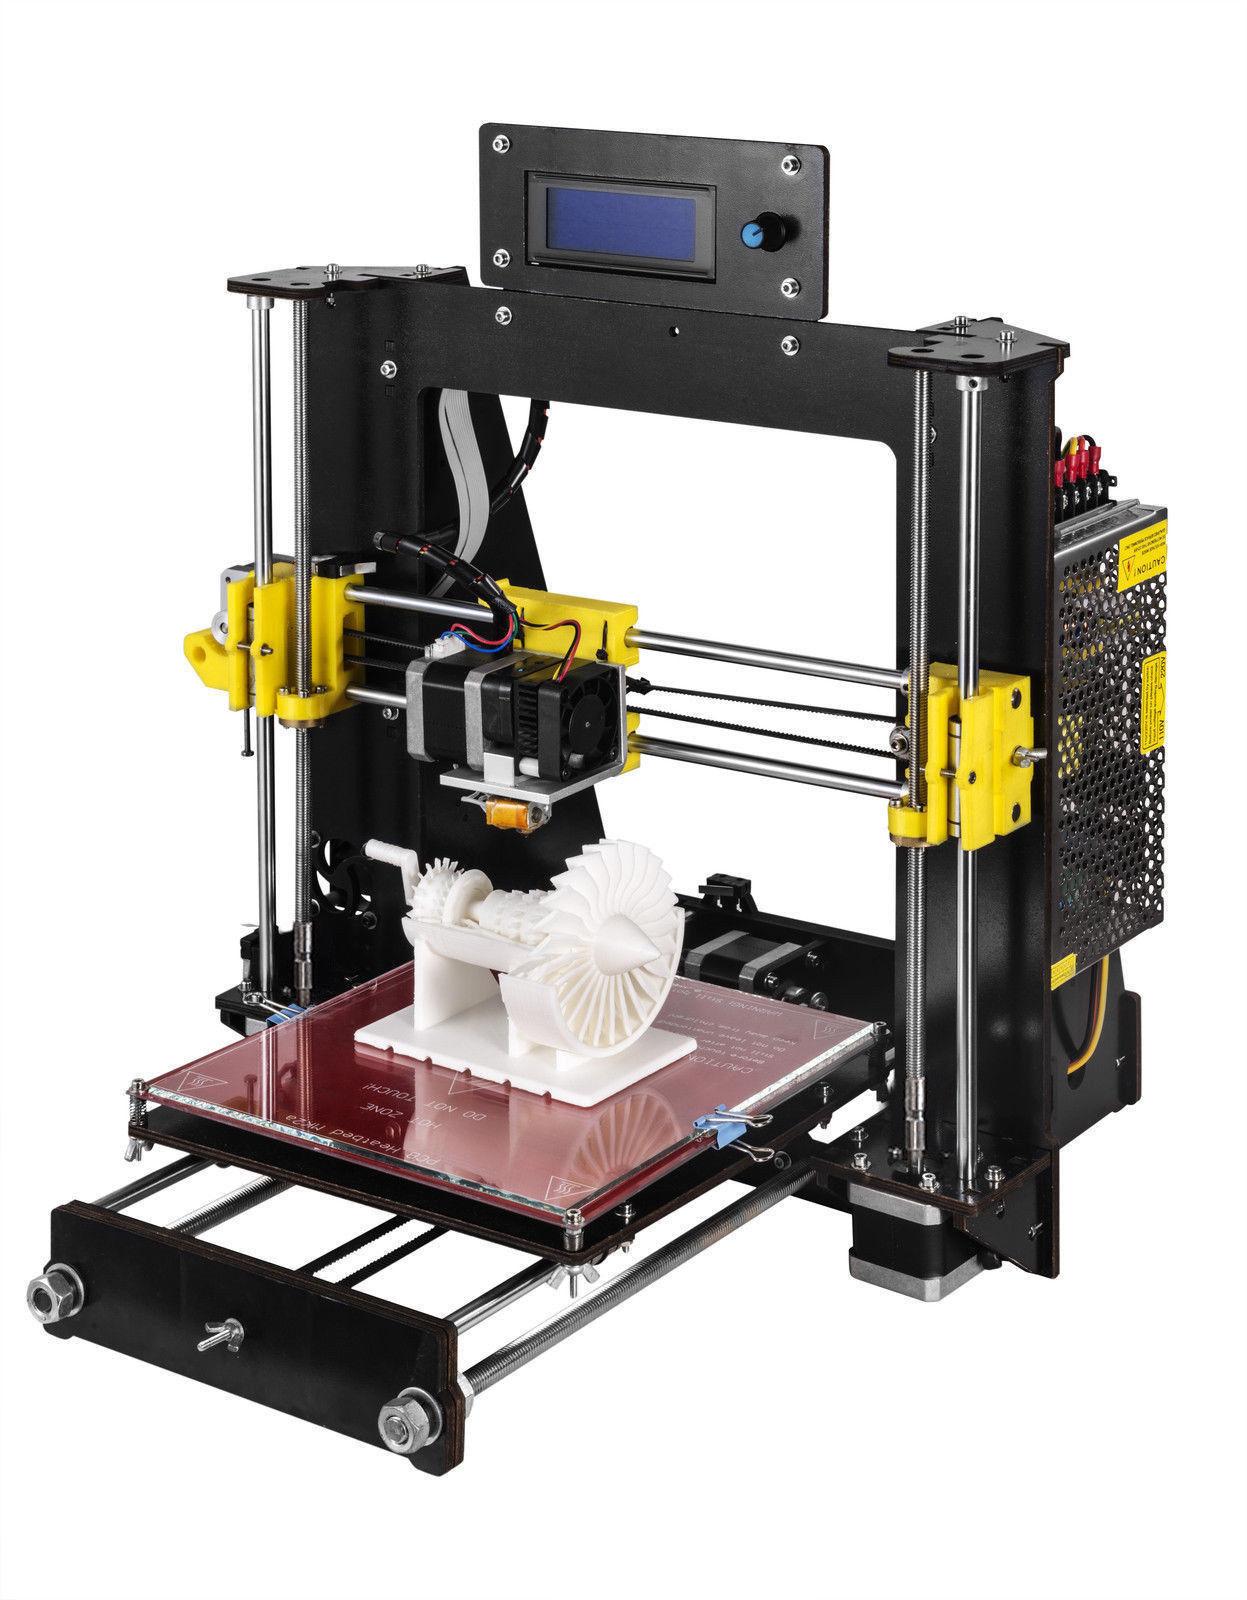 Imprimante 3D Reprap Prusa i3